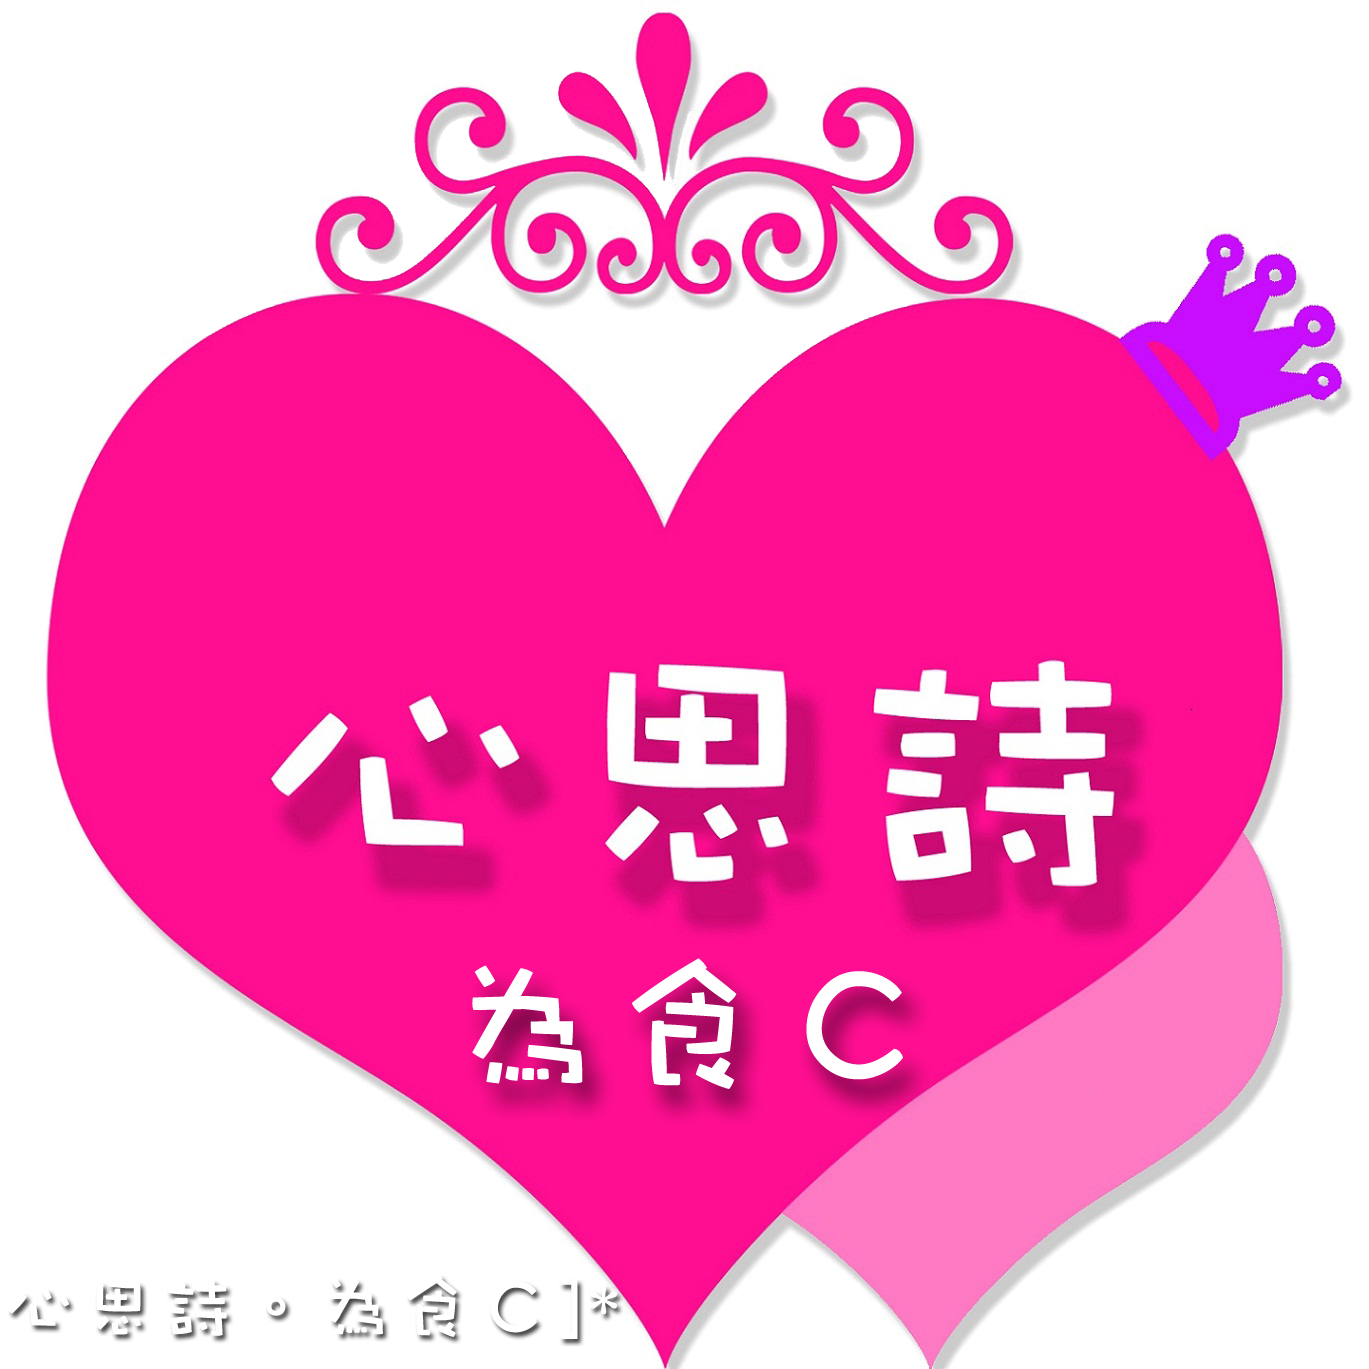 http://dl.dropbox.com/s/hj71oqa2ou7k4bt/logo2.png